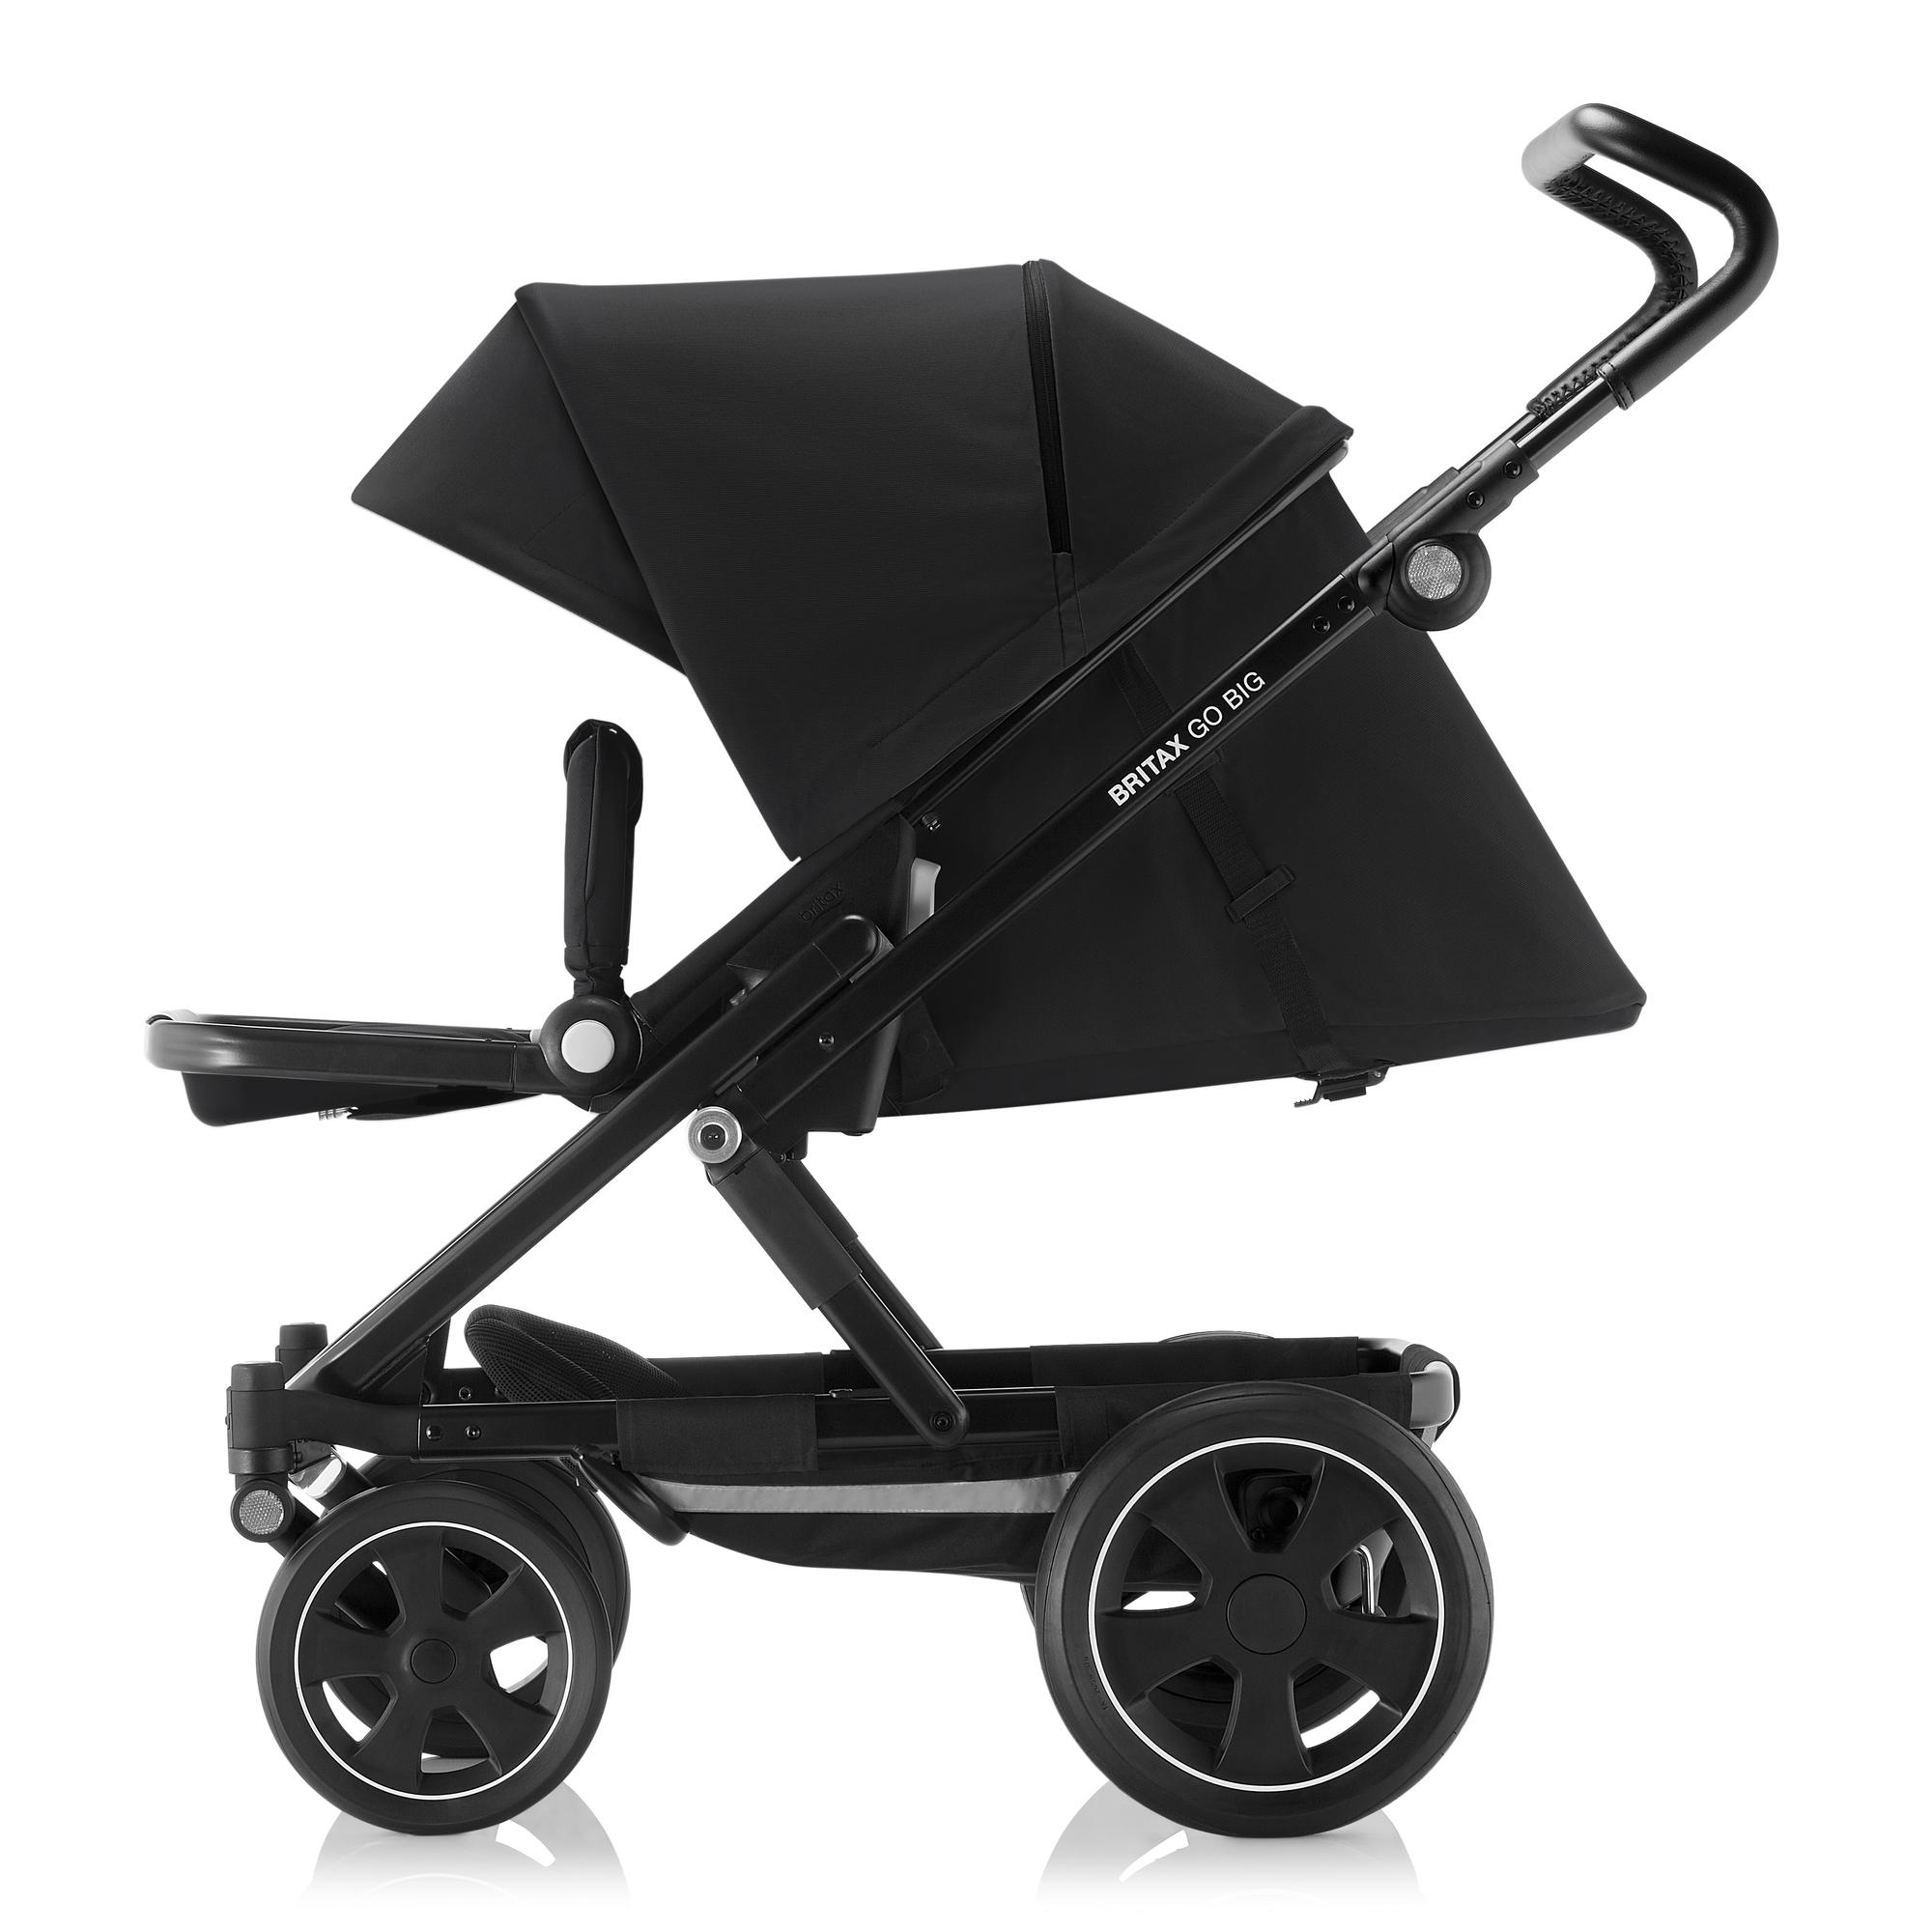 kombikinderwagen britax go big die zwergperten babyschalen reboarder kindersitze. Black Bedroom Furniture Sets. Home Design Ideas